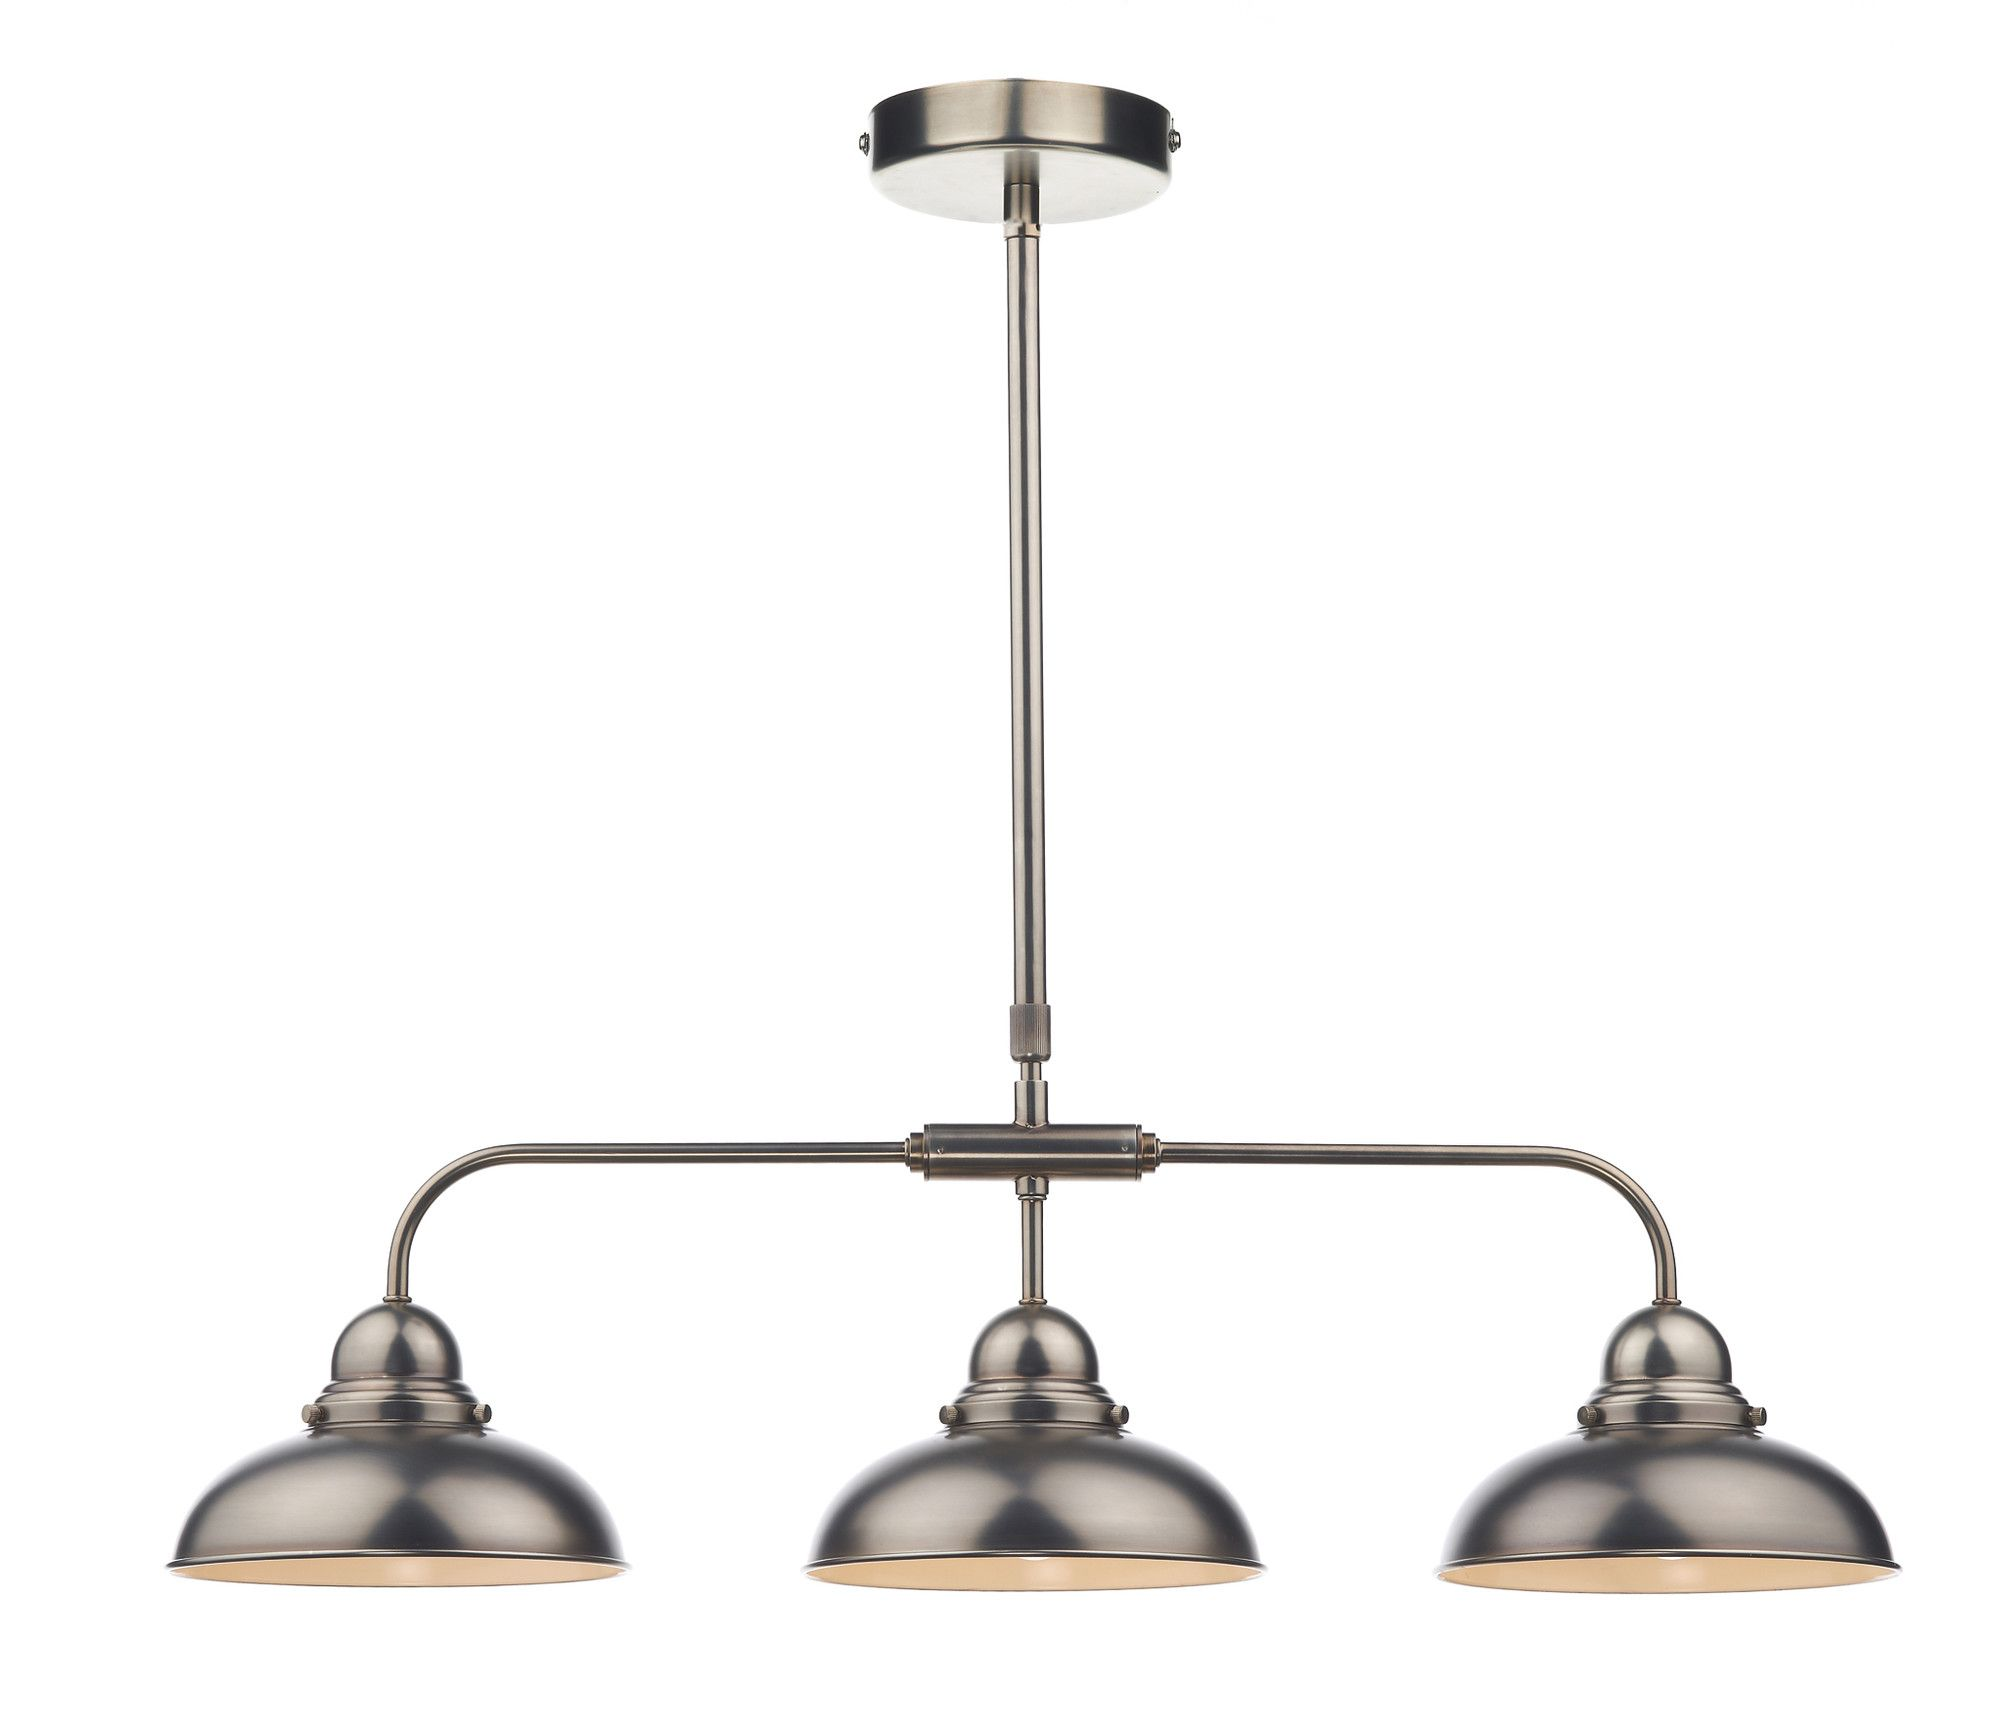 3 light kitchen island pendant rv appliances dar lighting dynamo